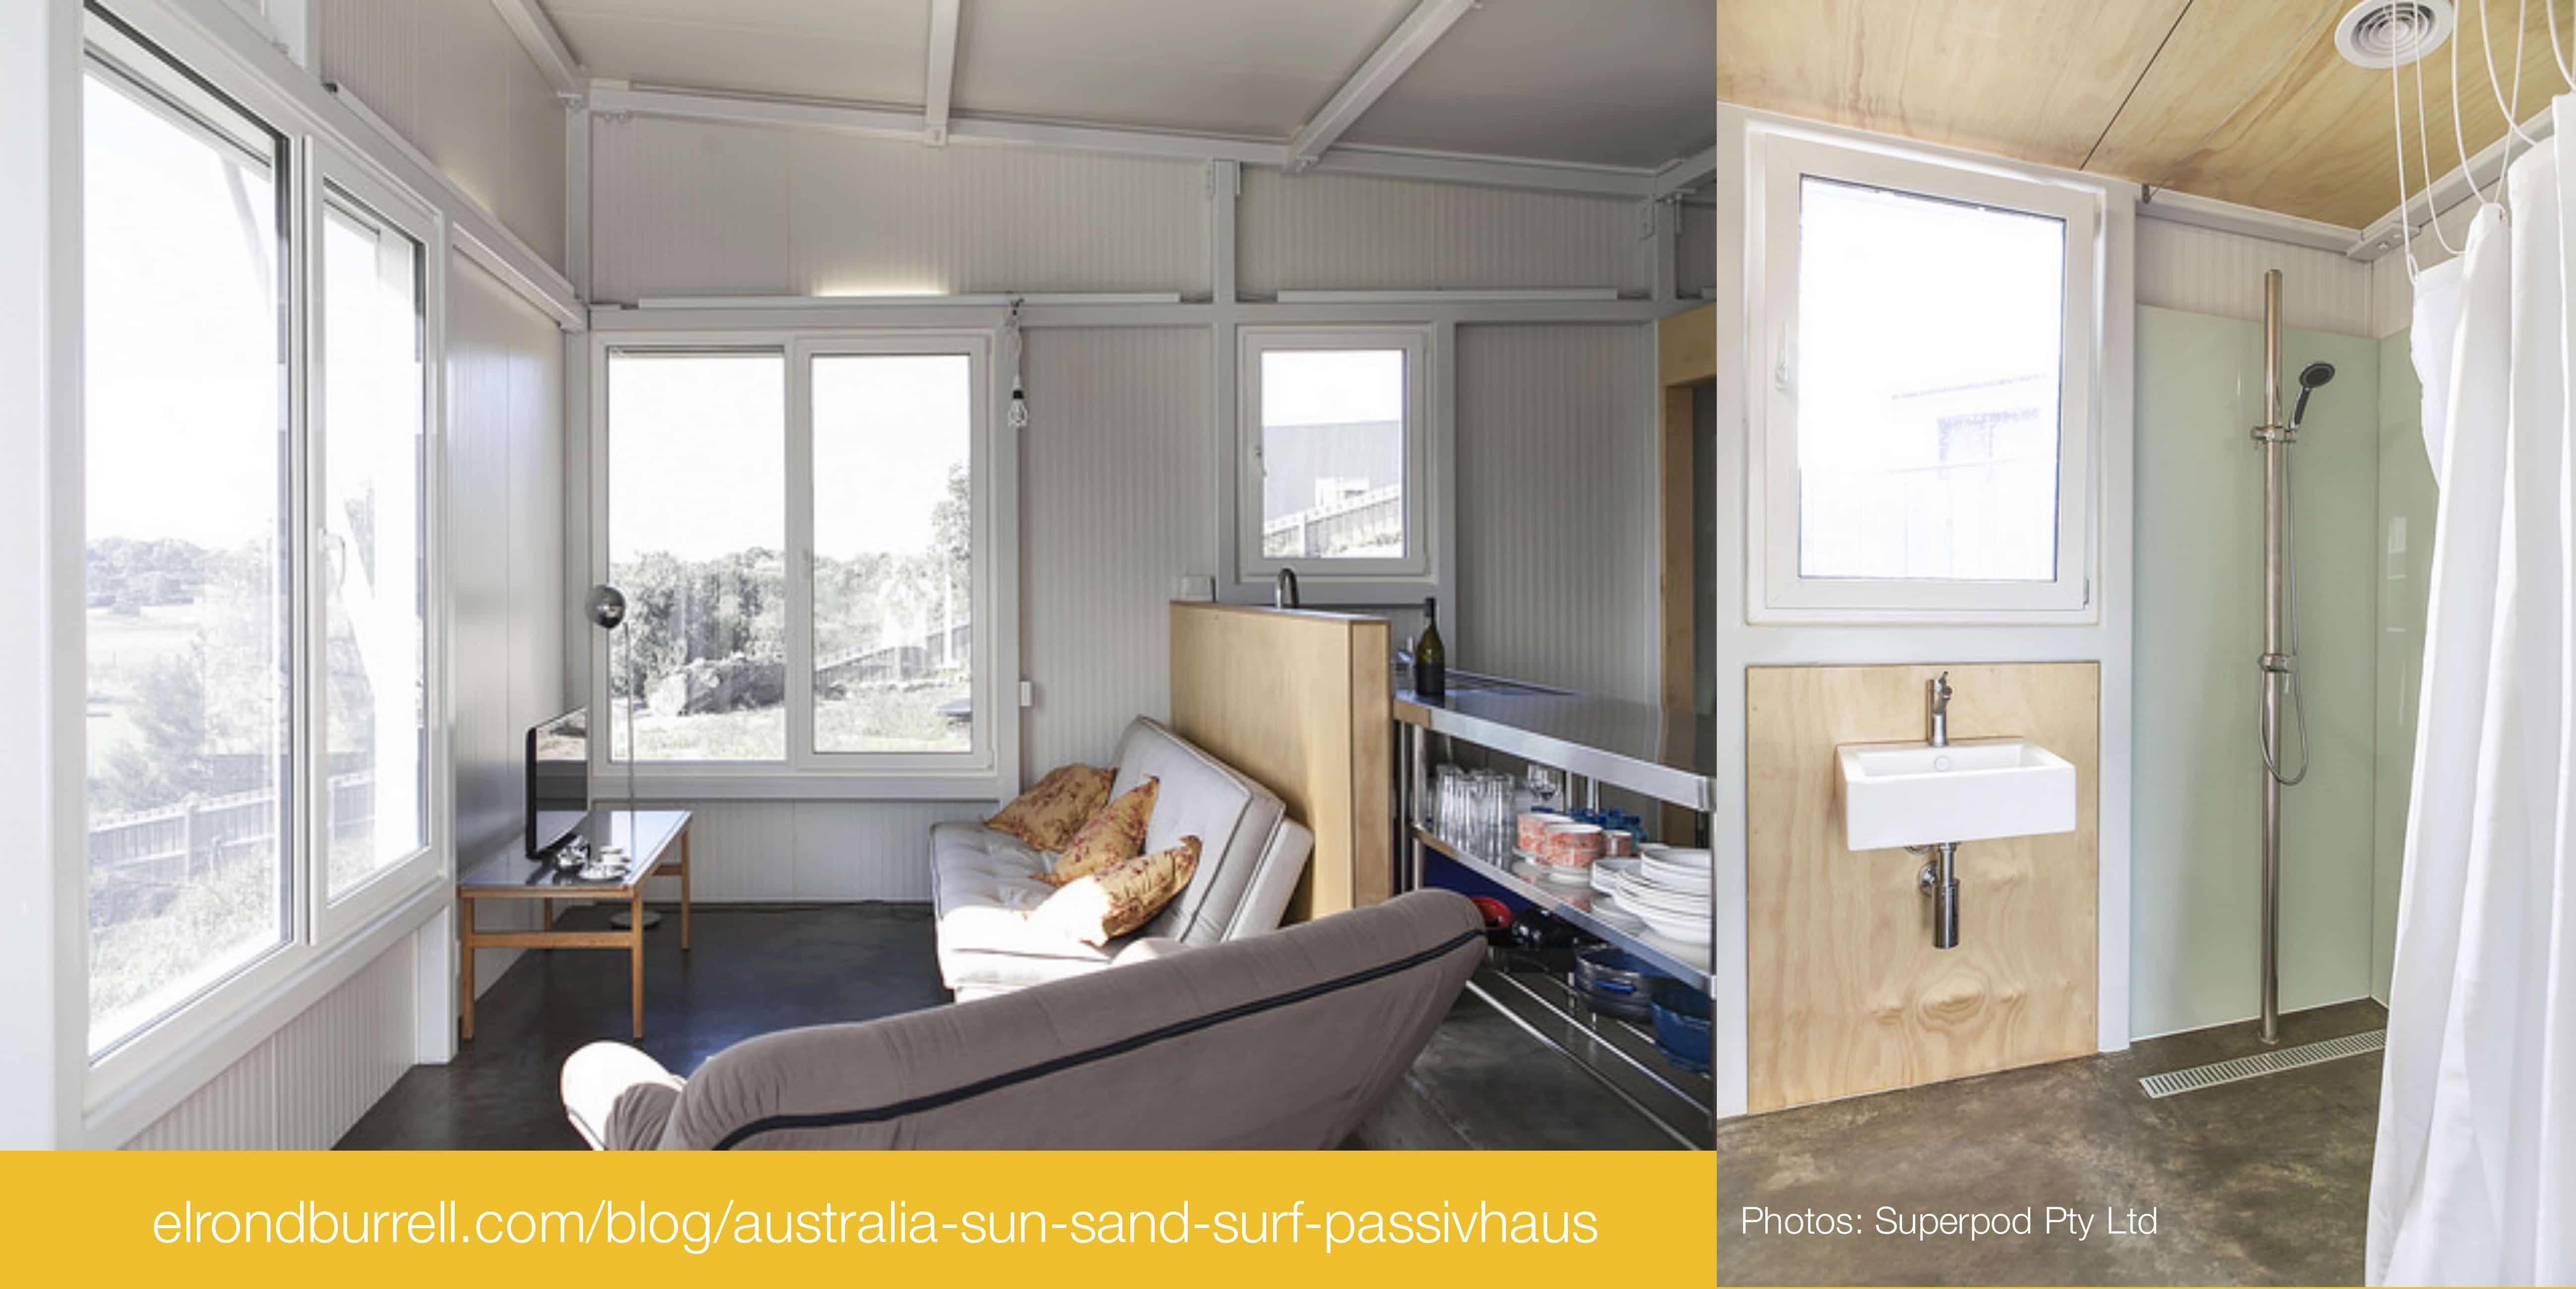 Australia: Sun Sand Surf And Passivhaus (Superpod)